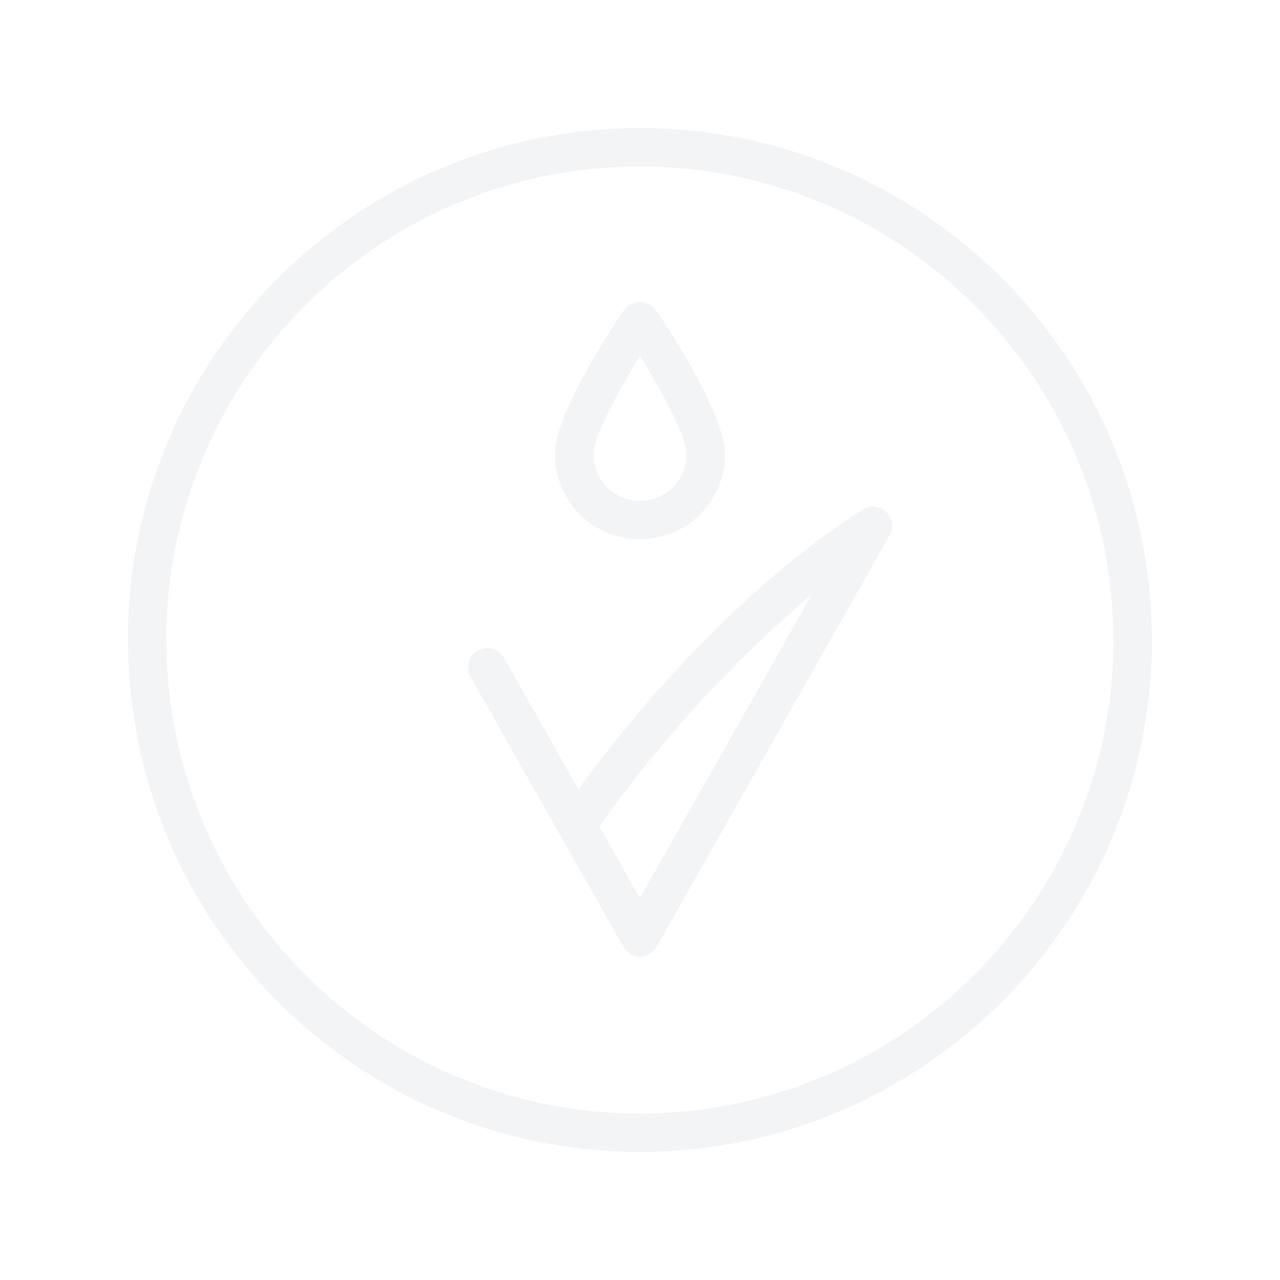 Karl Lagerfeld Paradise Bay For Men Eau De Toilette